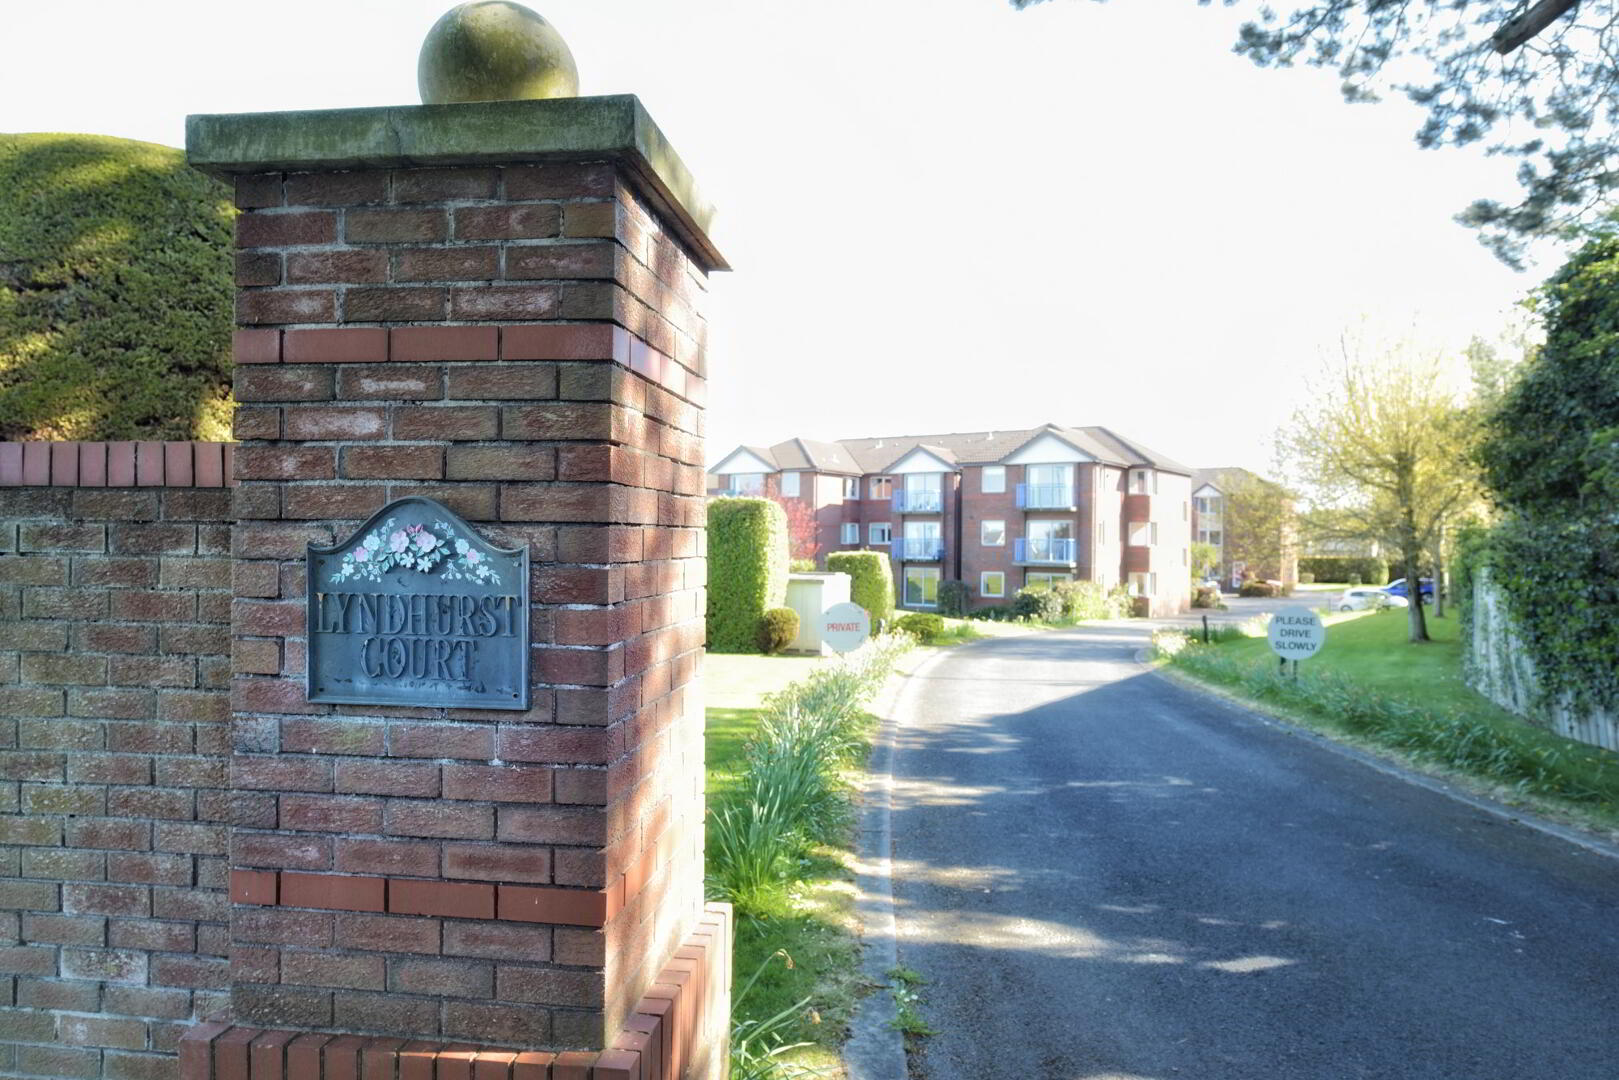 Photo 1 of 2 Lyndhurst Court, Bangor